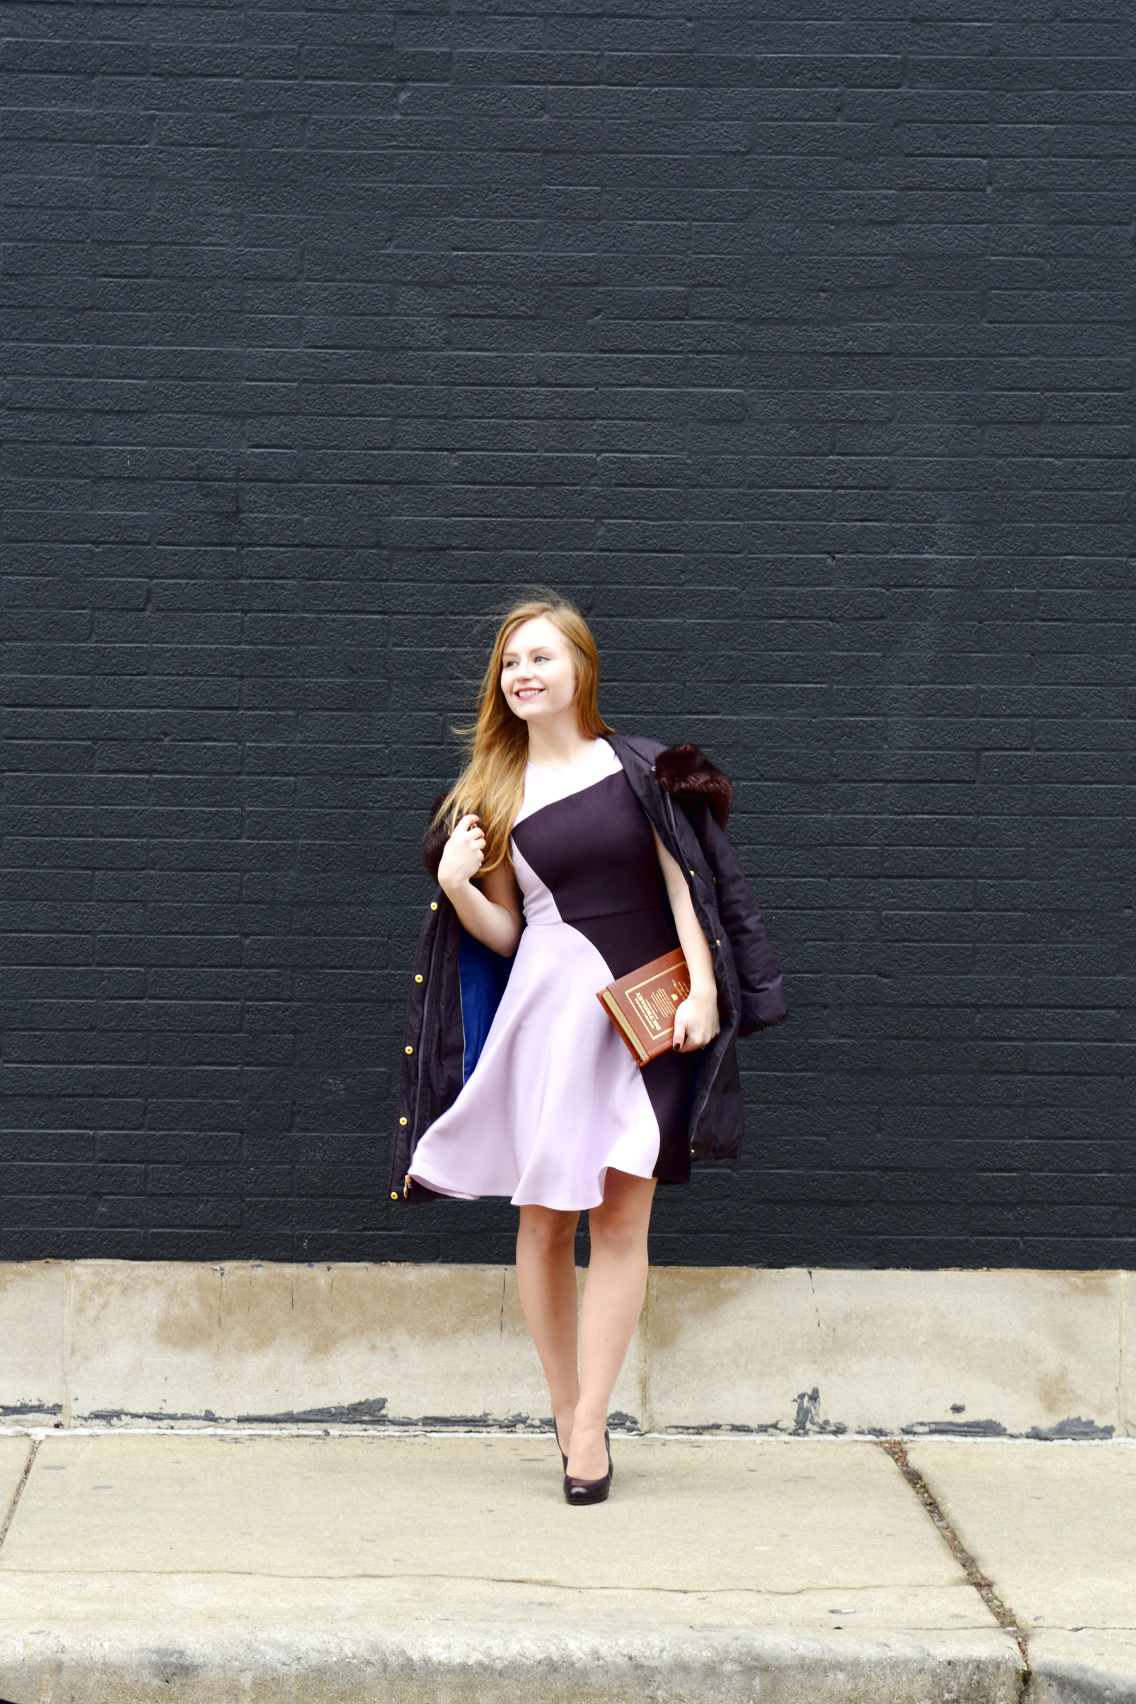 3.1 Phillip Lim Colorblock Dress Kate Spade Dictionary Clutch 1